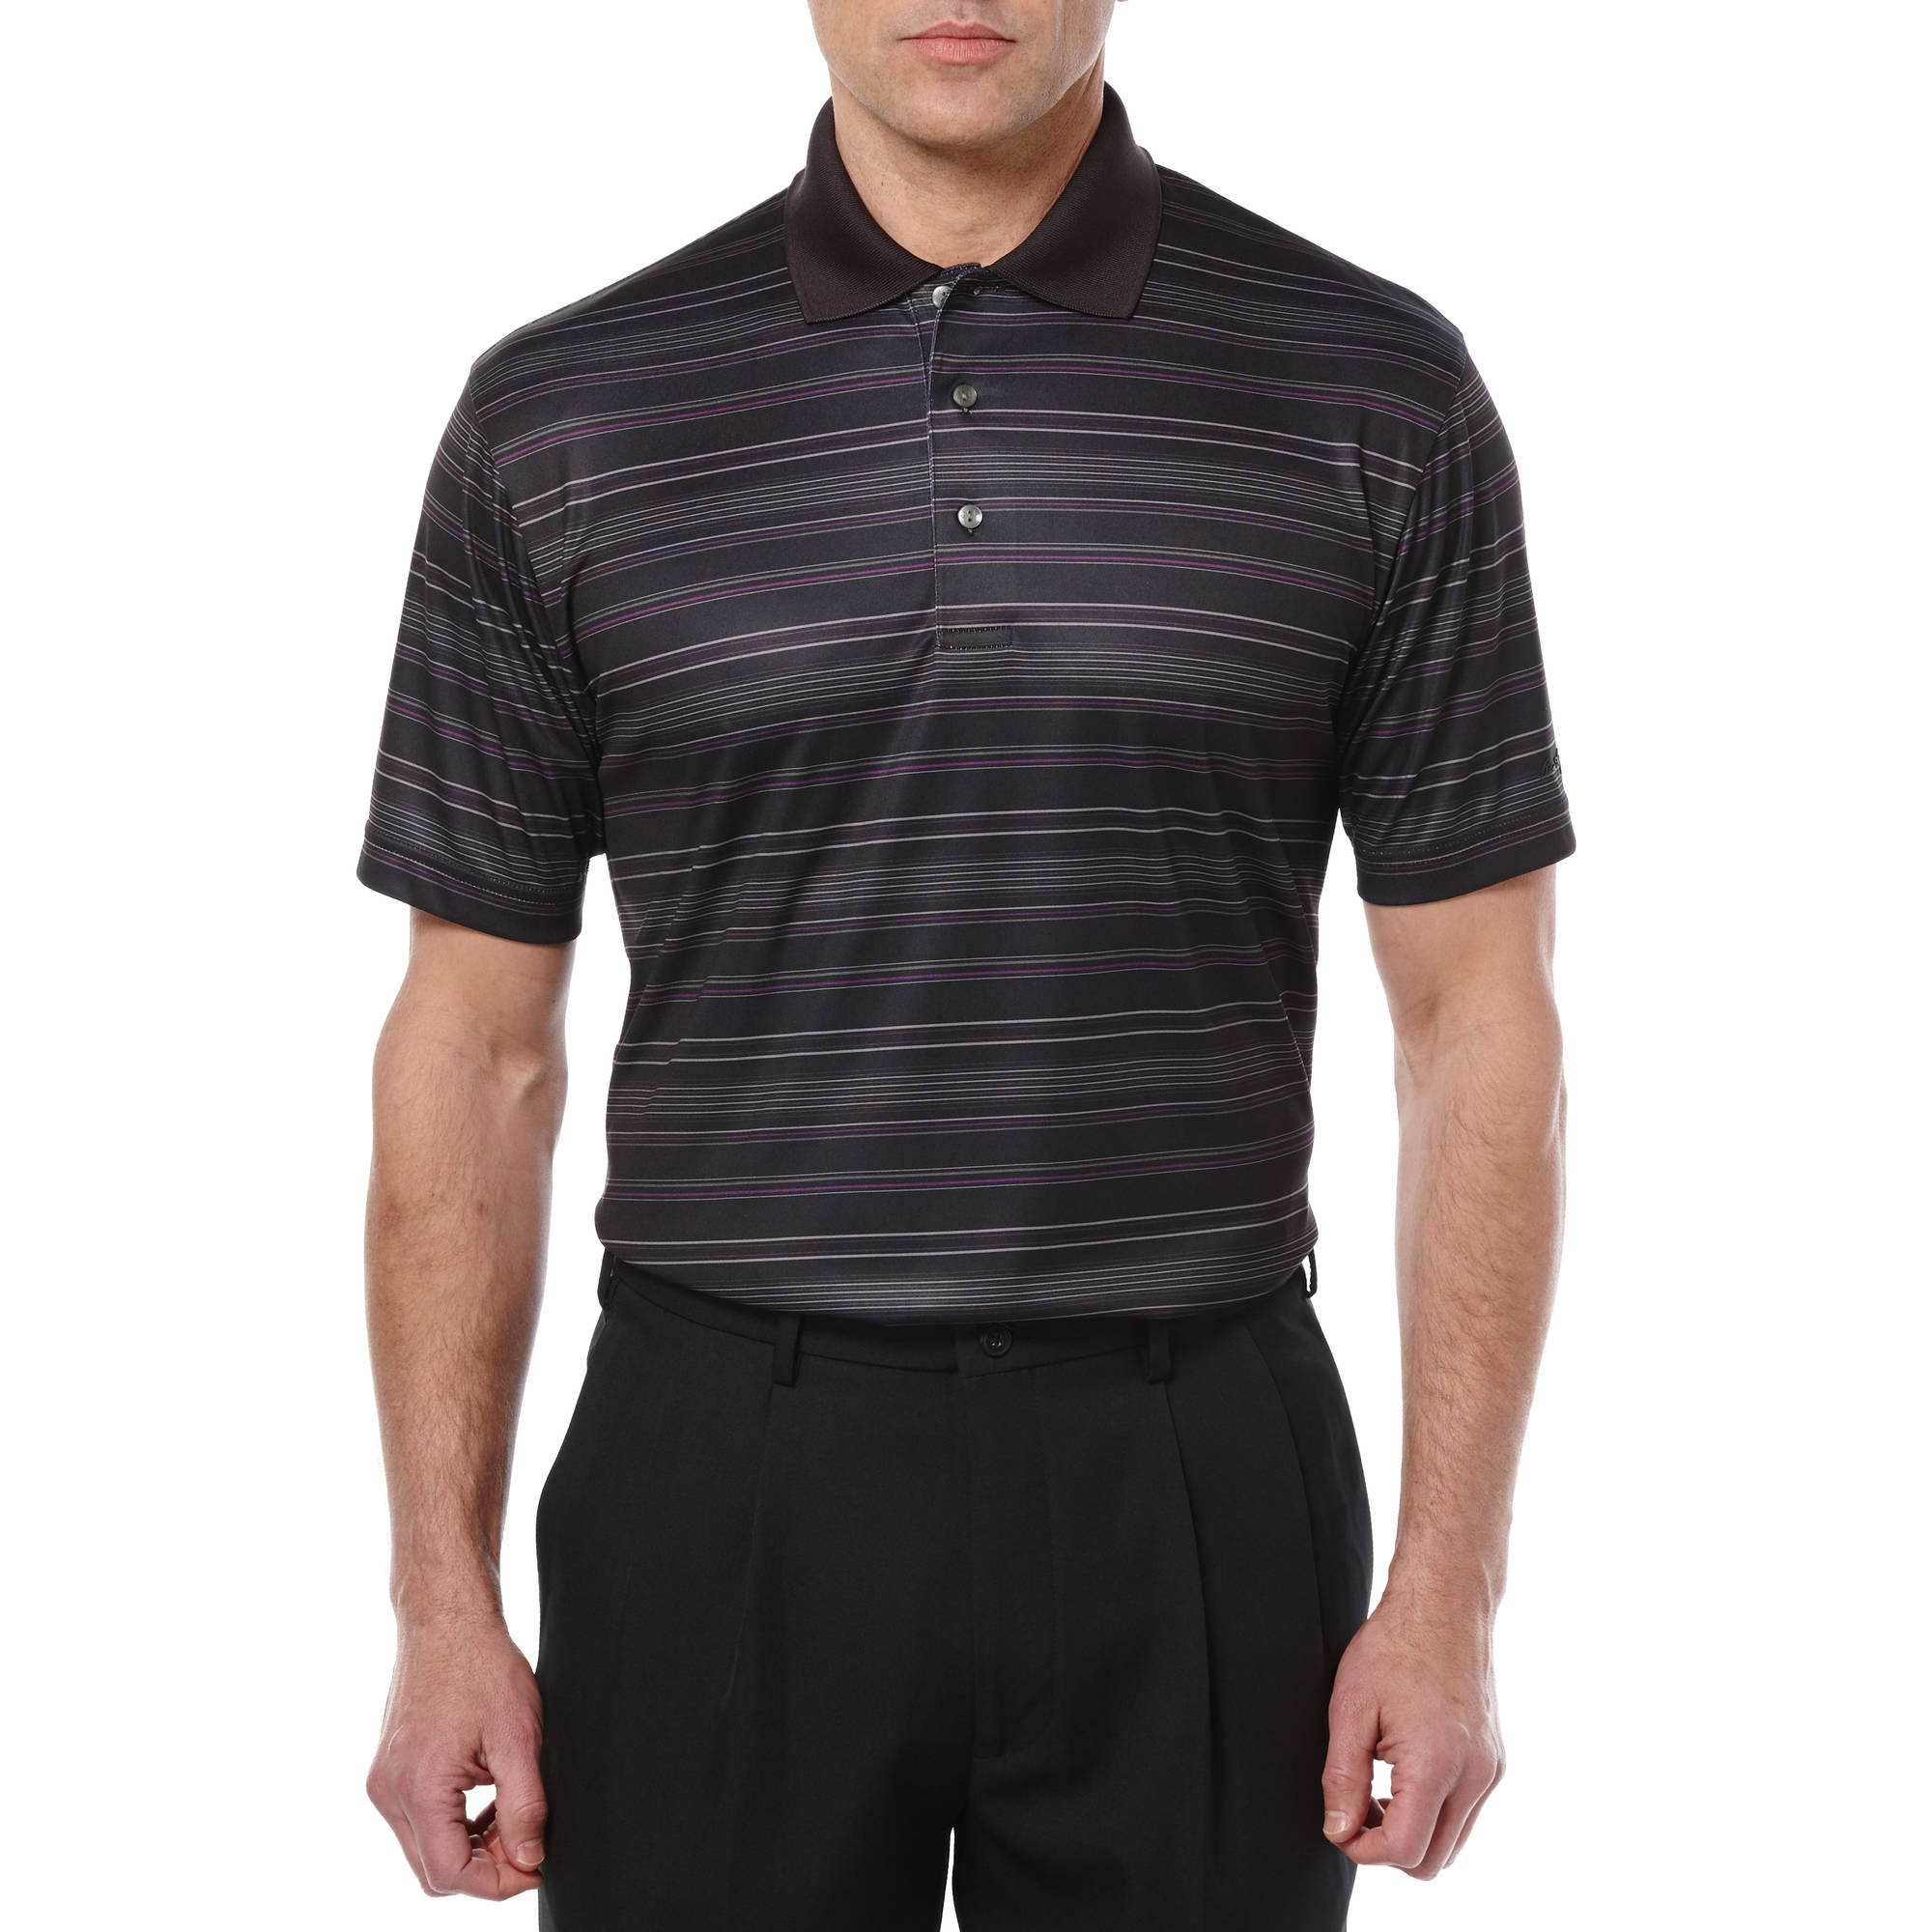 Ben Hogan Performance Big Men's Fine Line Stripe Polo Shirt